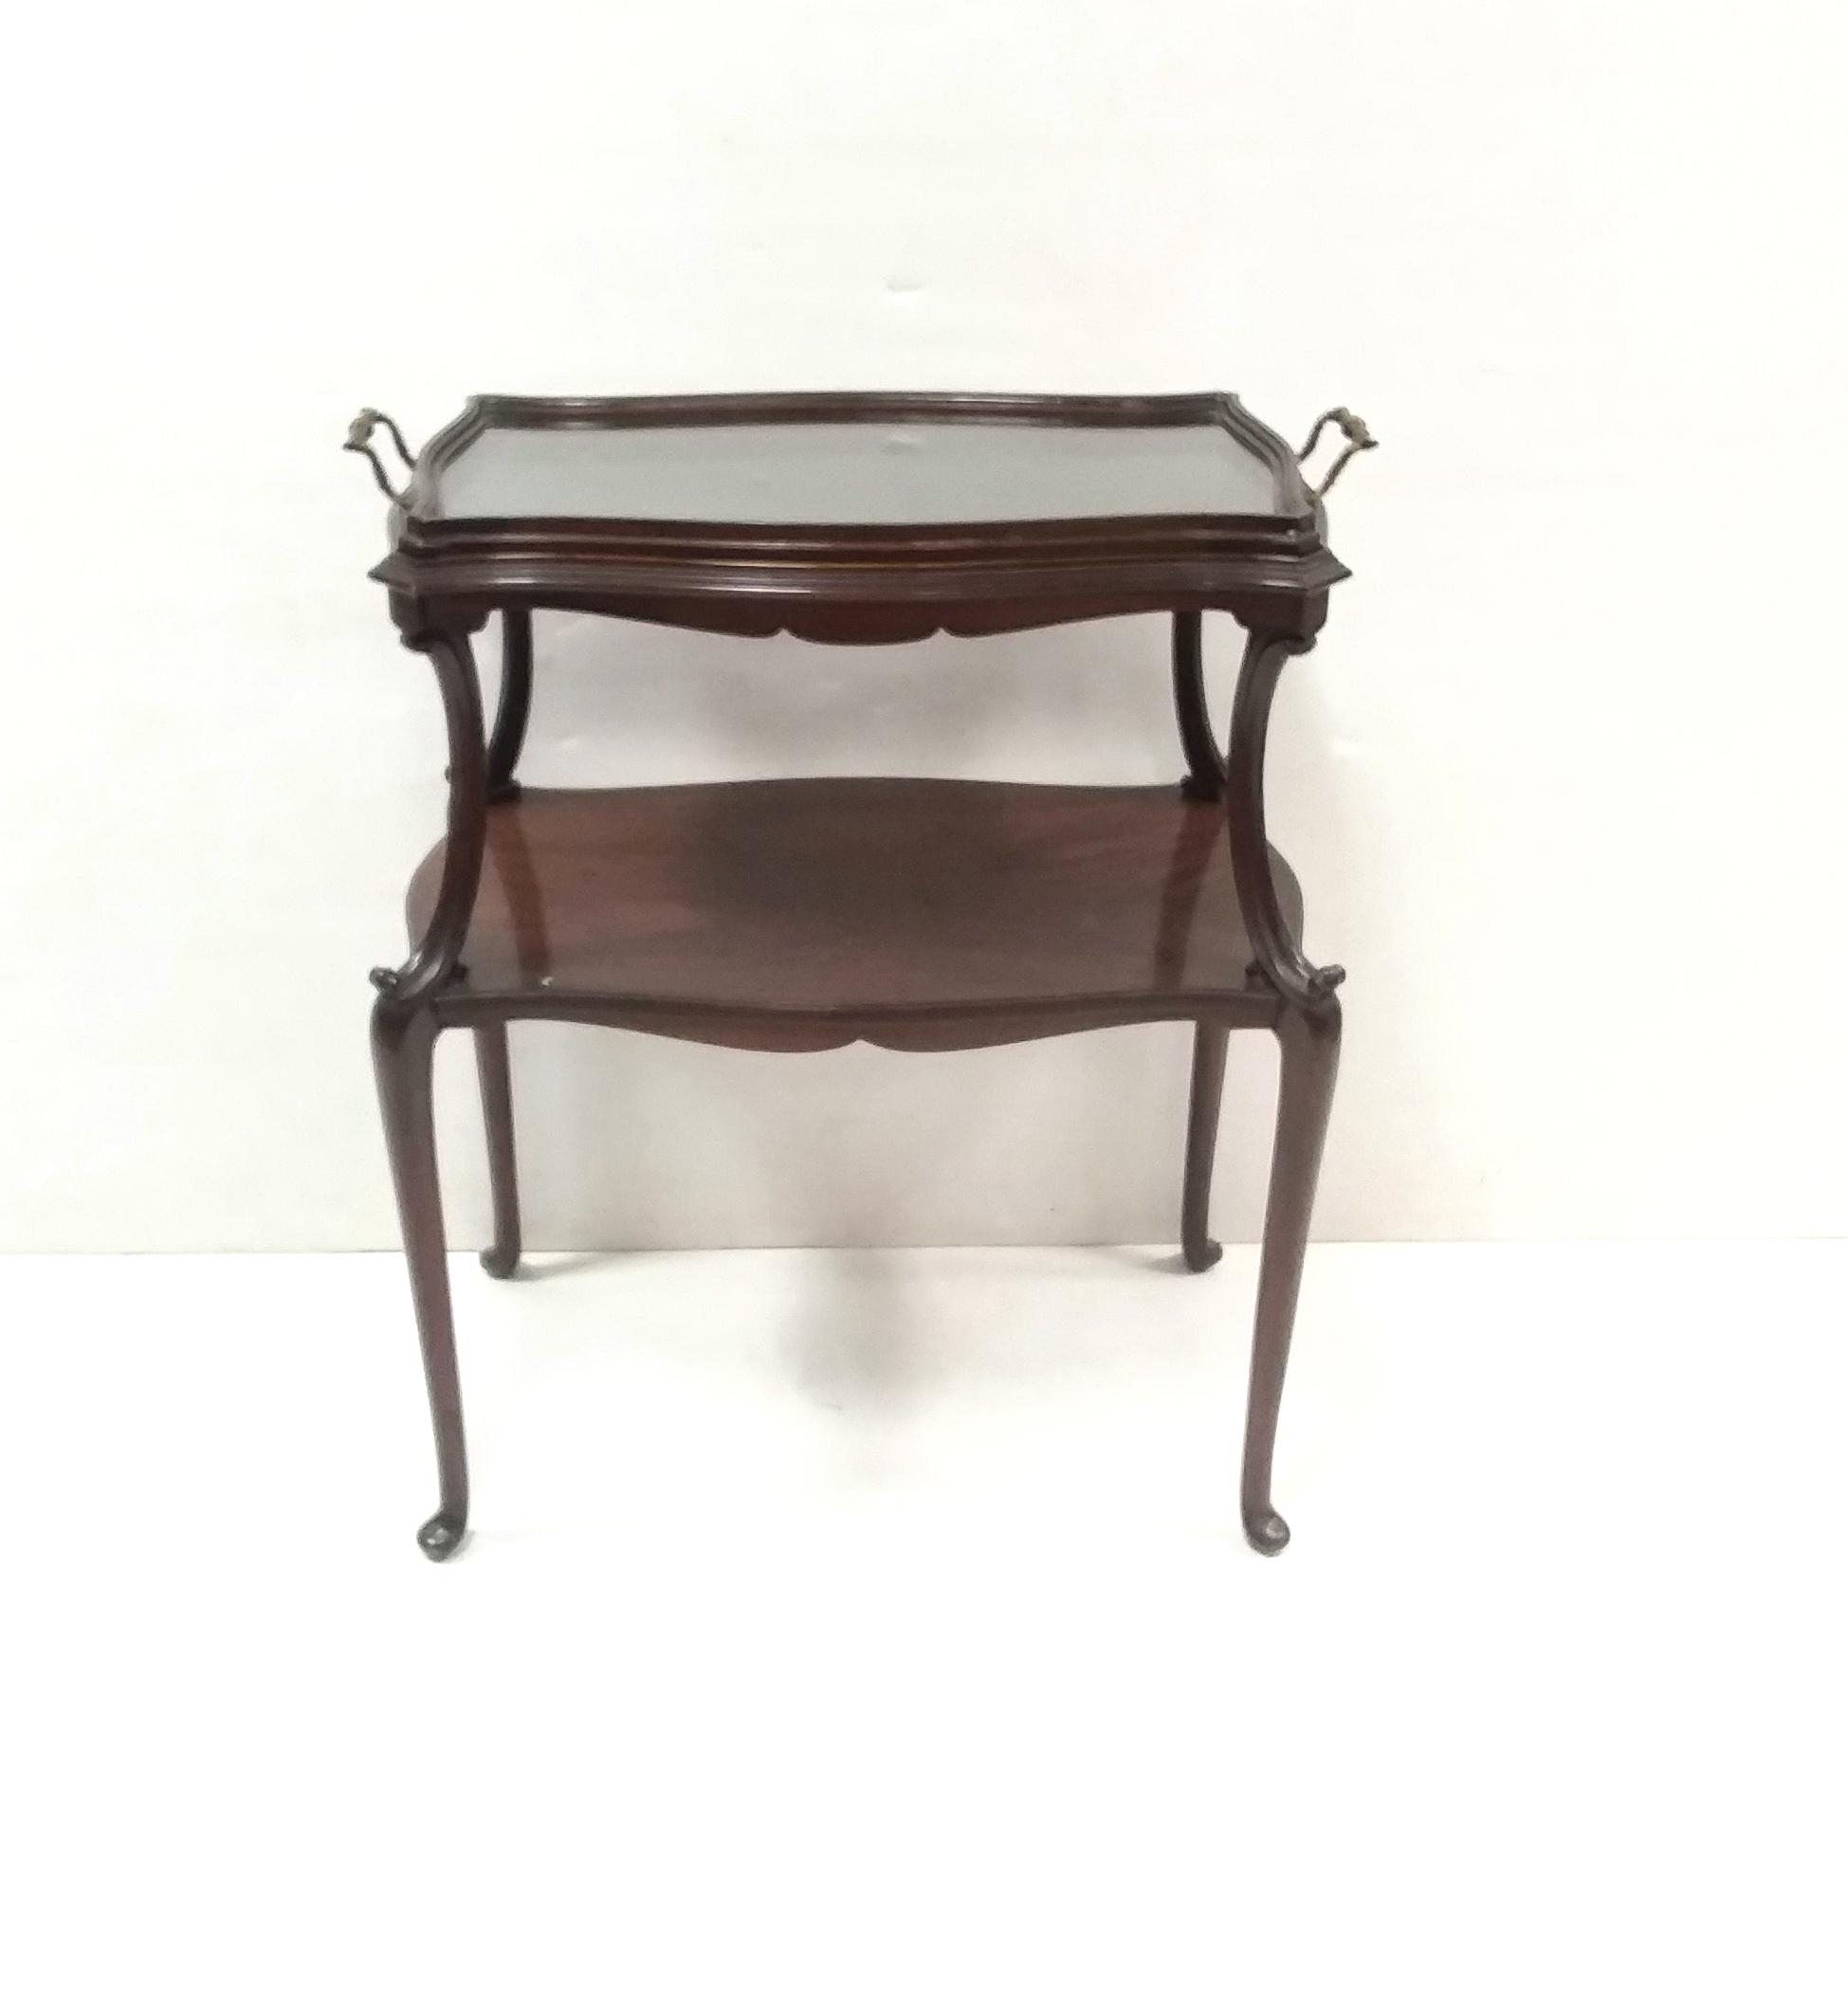 Antique_Edwardian_Serving_Table